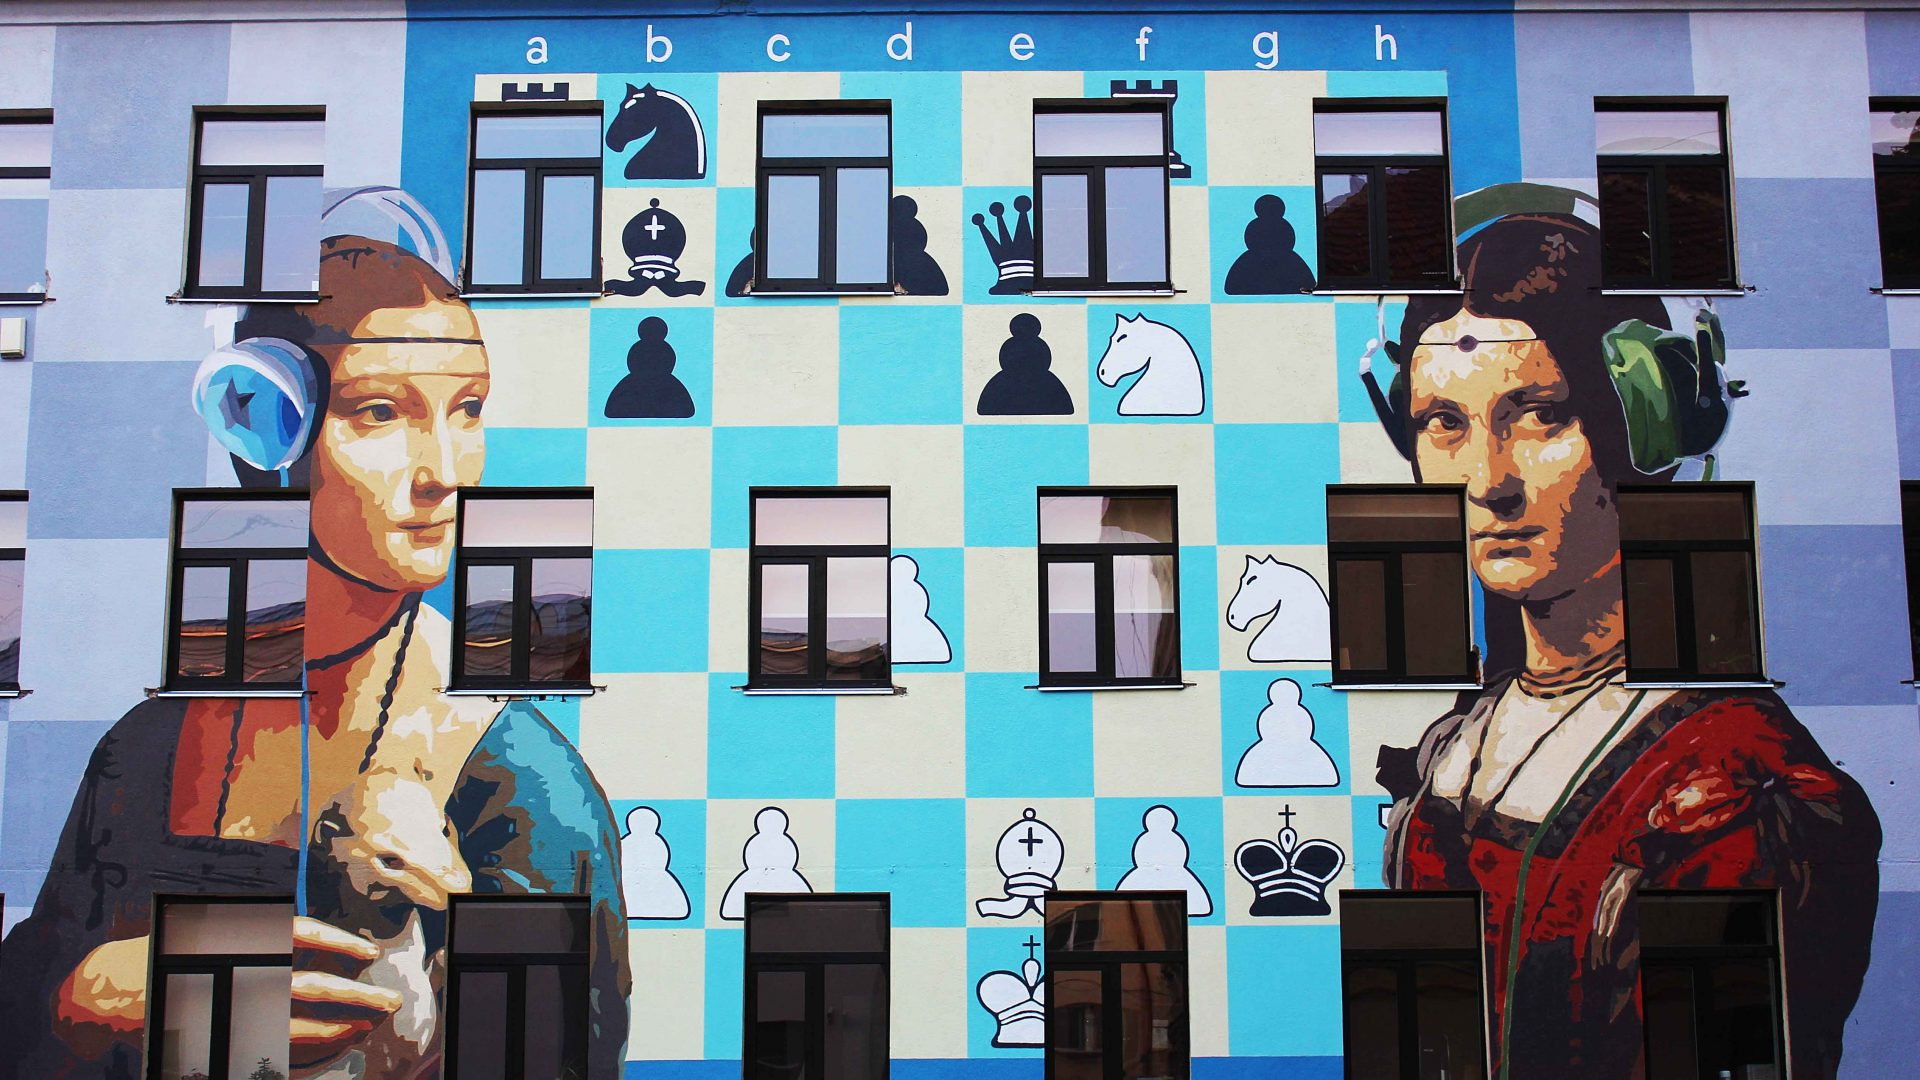 Linas Kaziulionis fonde l'arte classica con la street art